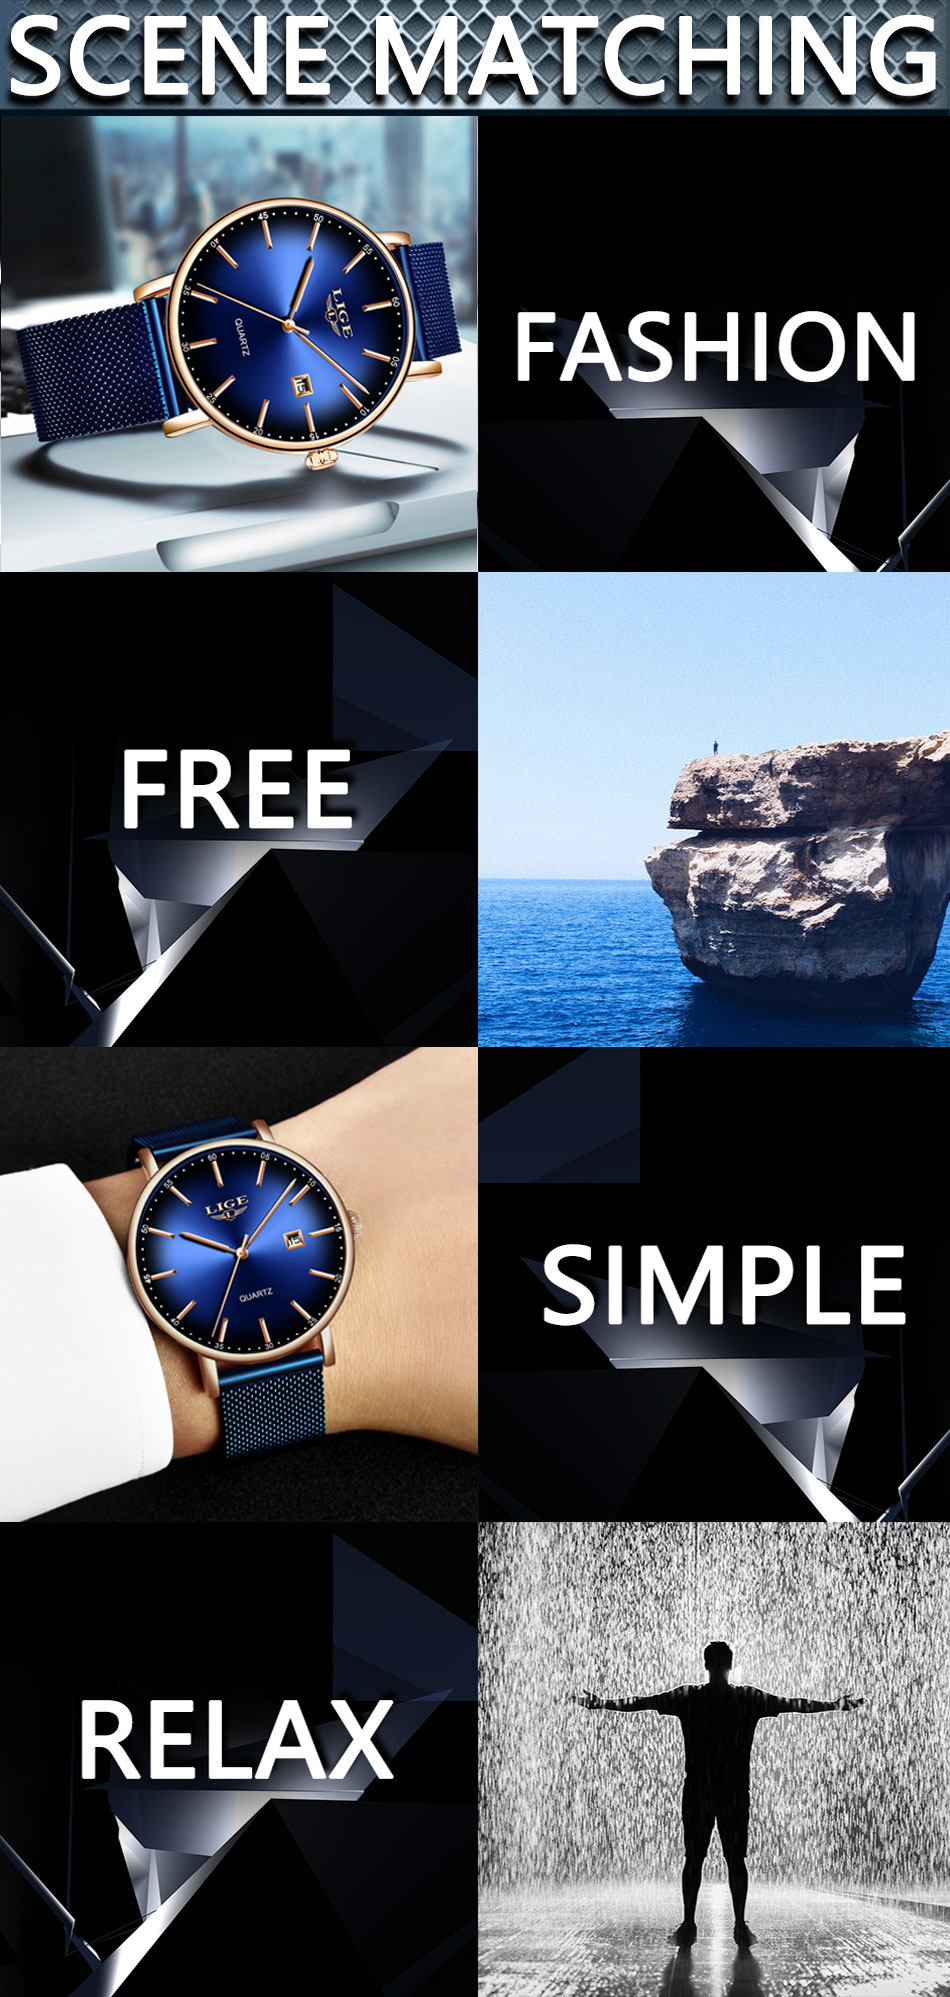 Hc57431d38d754527b286a0750ef3ee09R LIGE Fashion Mens Watches Top Brand Luxury Blue Waterproof Watches Ultra Thin Date Simple Casual Quartz Watch Men Sports Clock